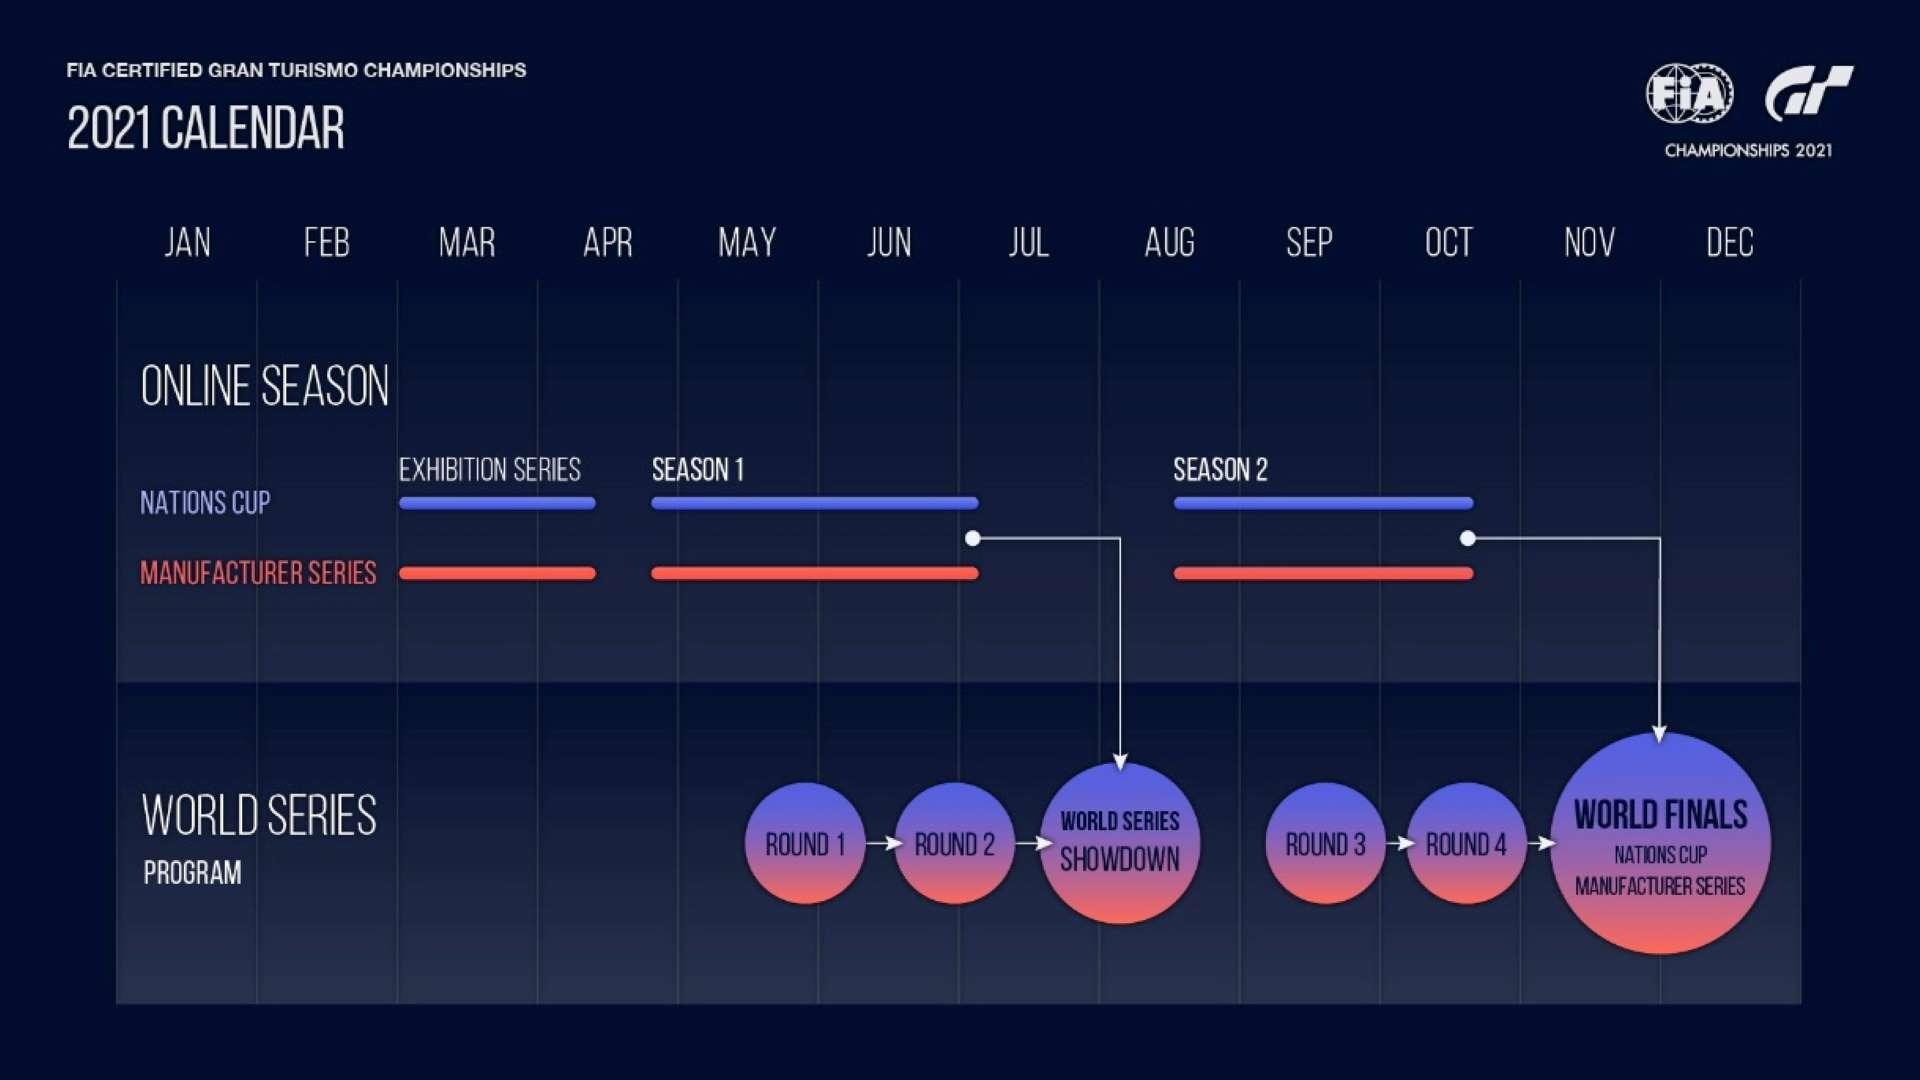 FIA Certified Gran Turismo Championships 2021 - Kalender